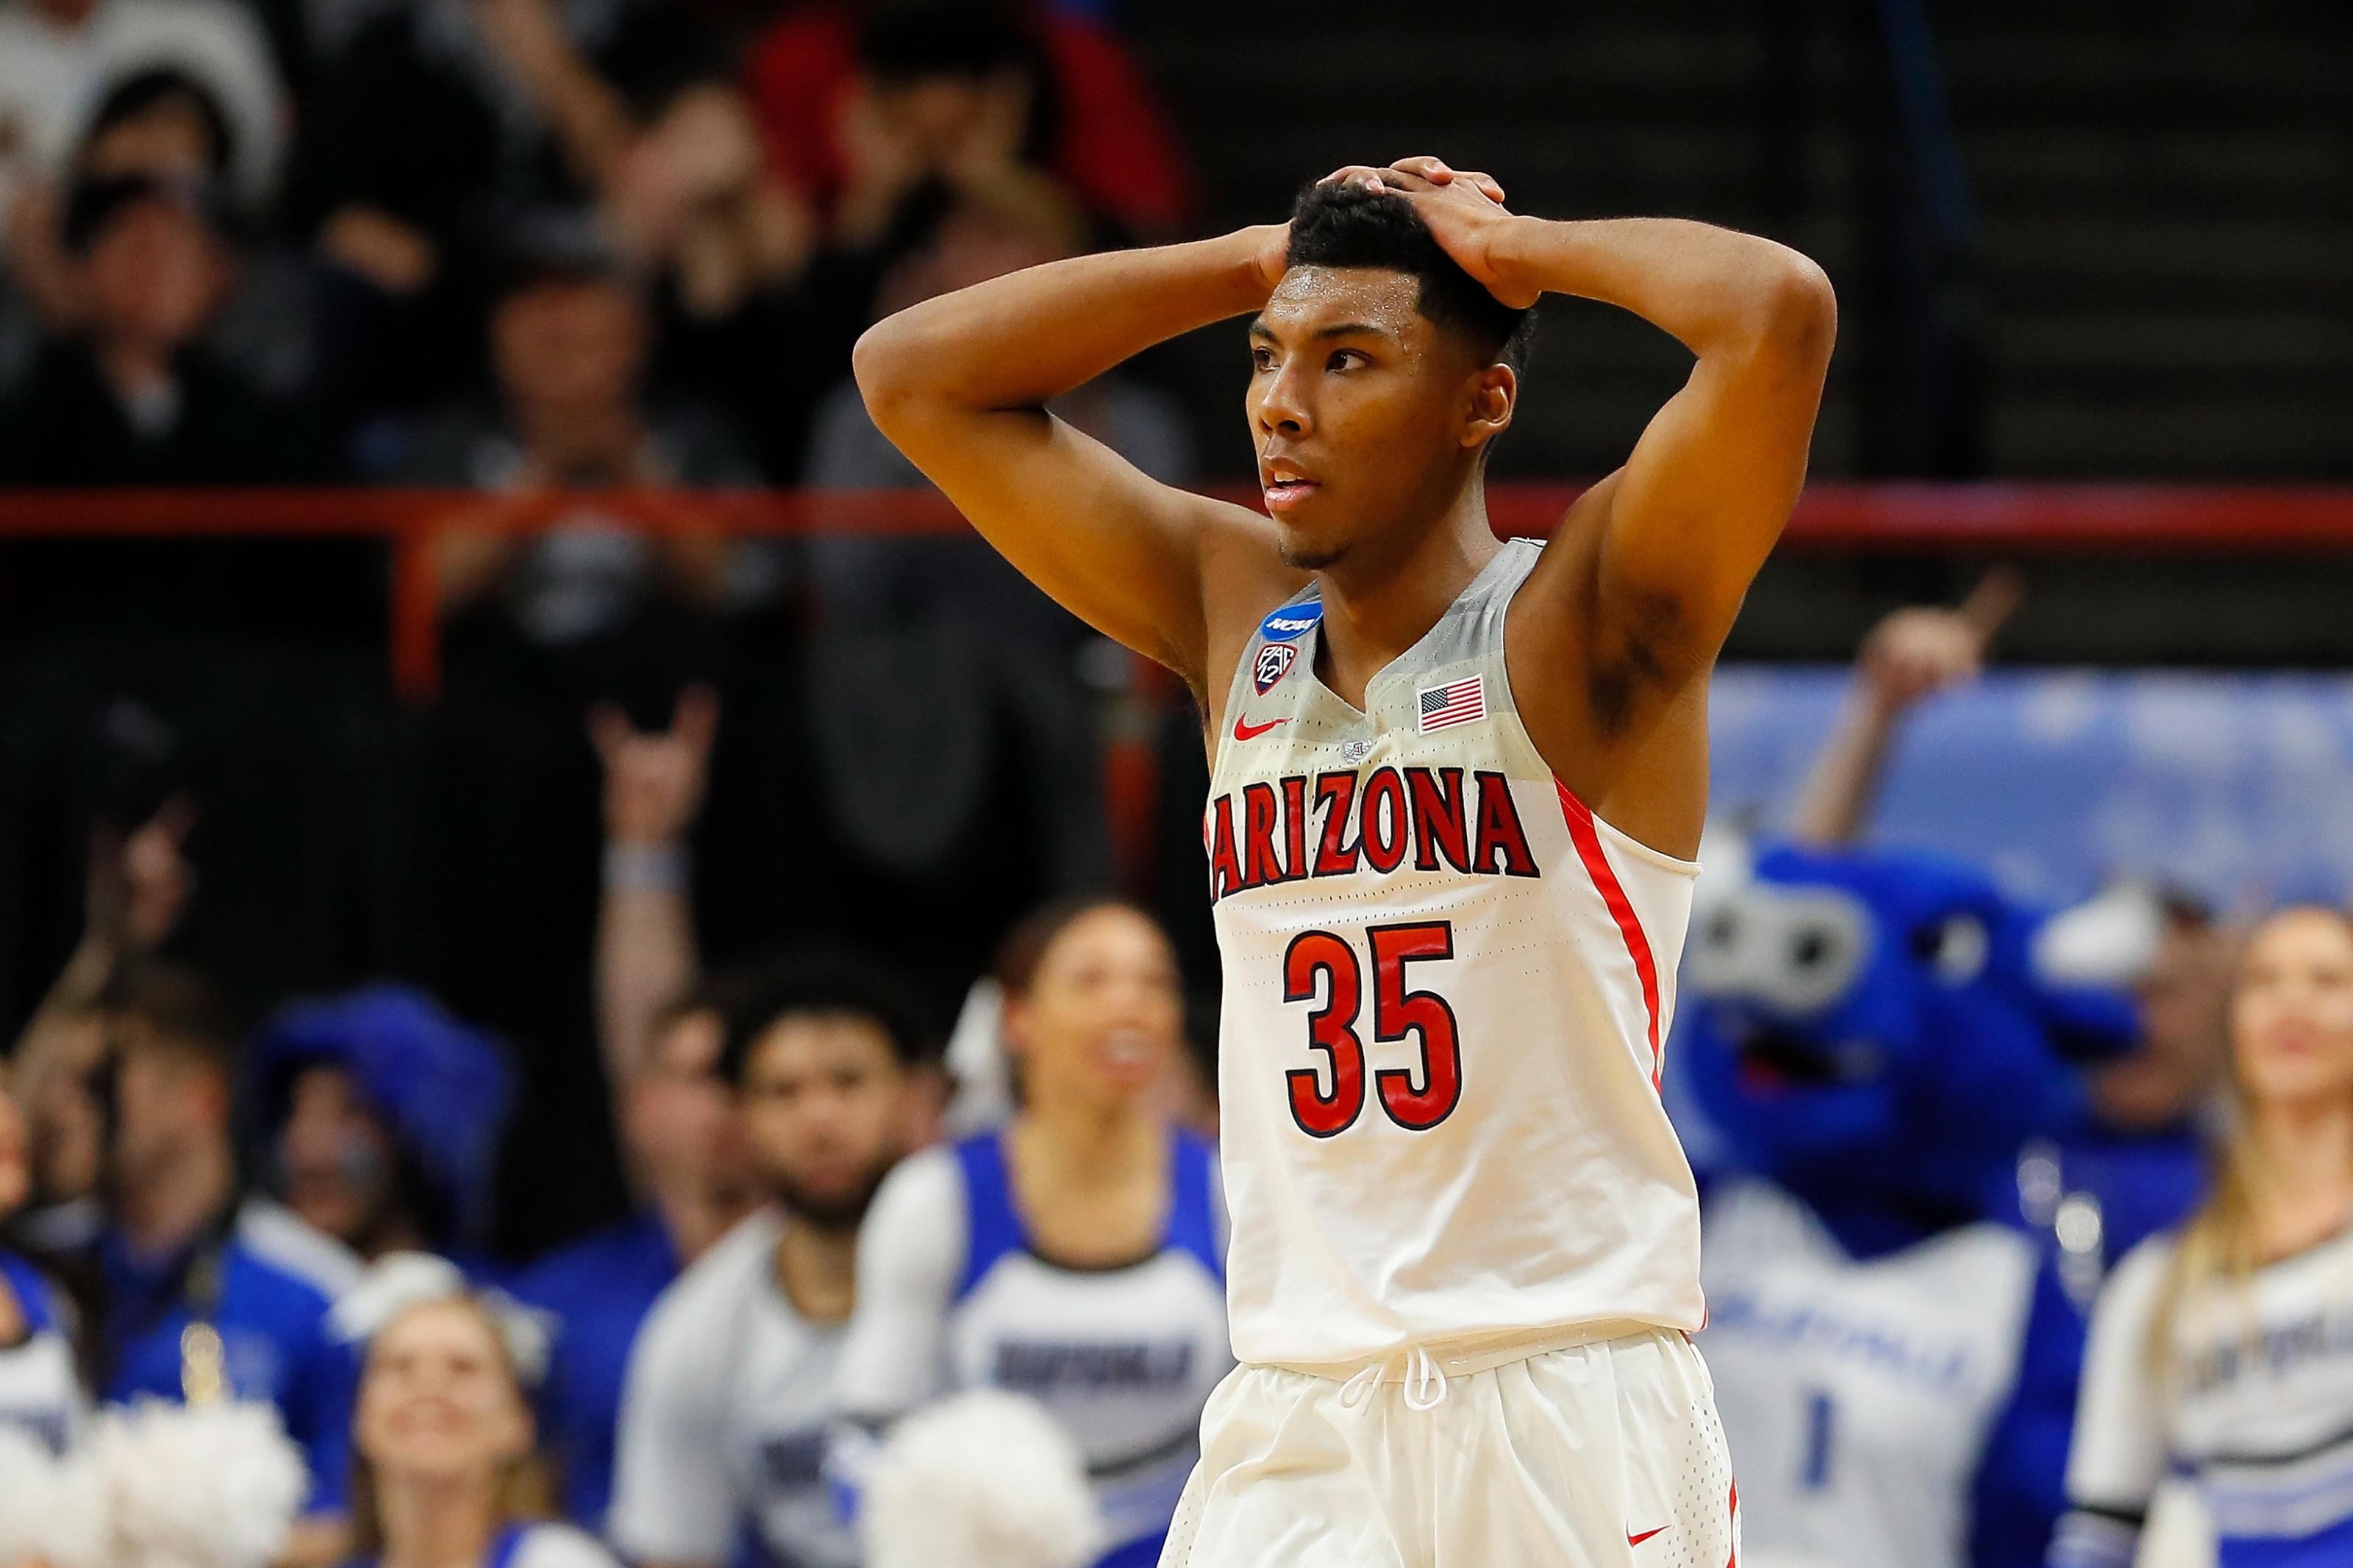 Former Arizona Basketball Star Allonzo Trier Remarkably Efficient ...